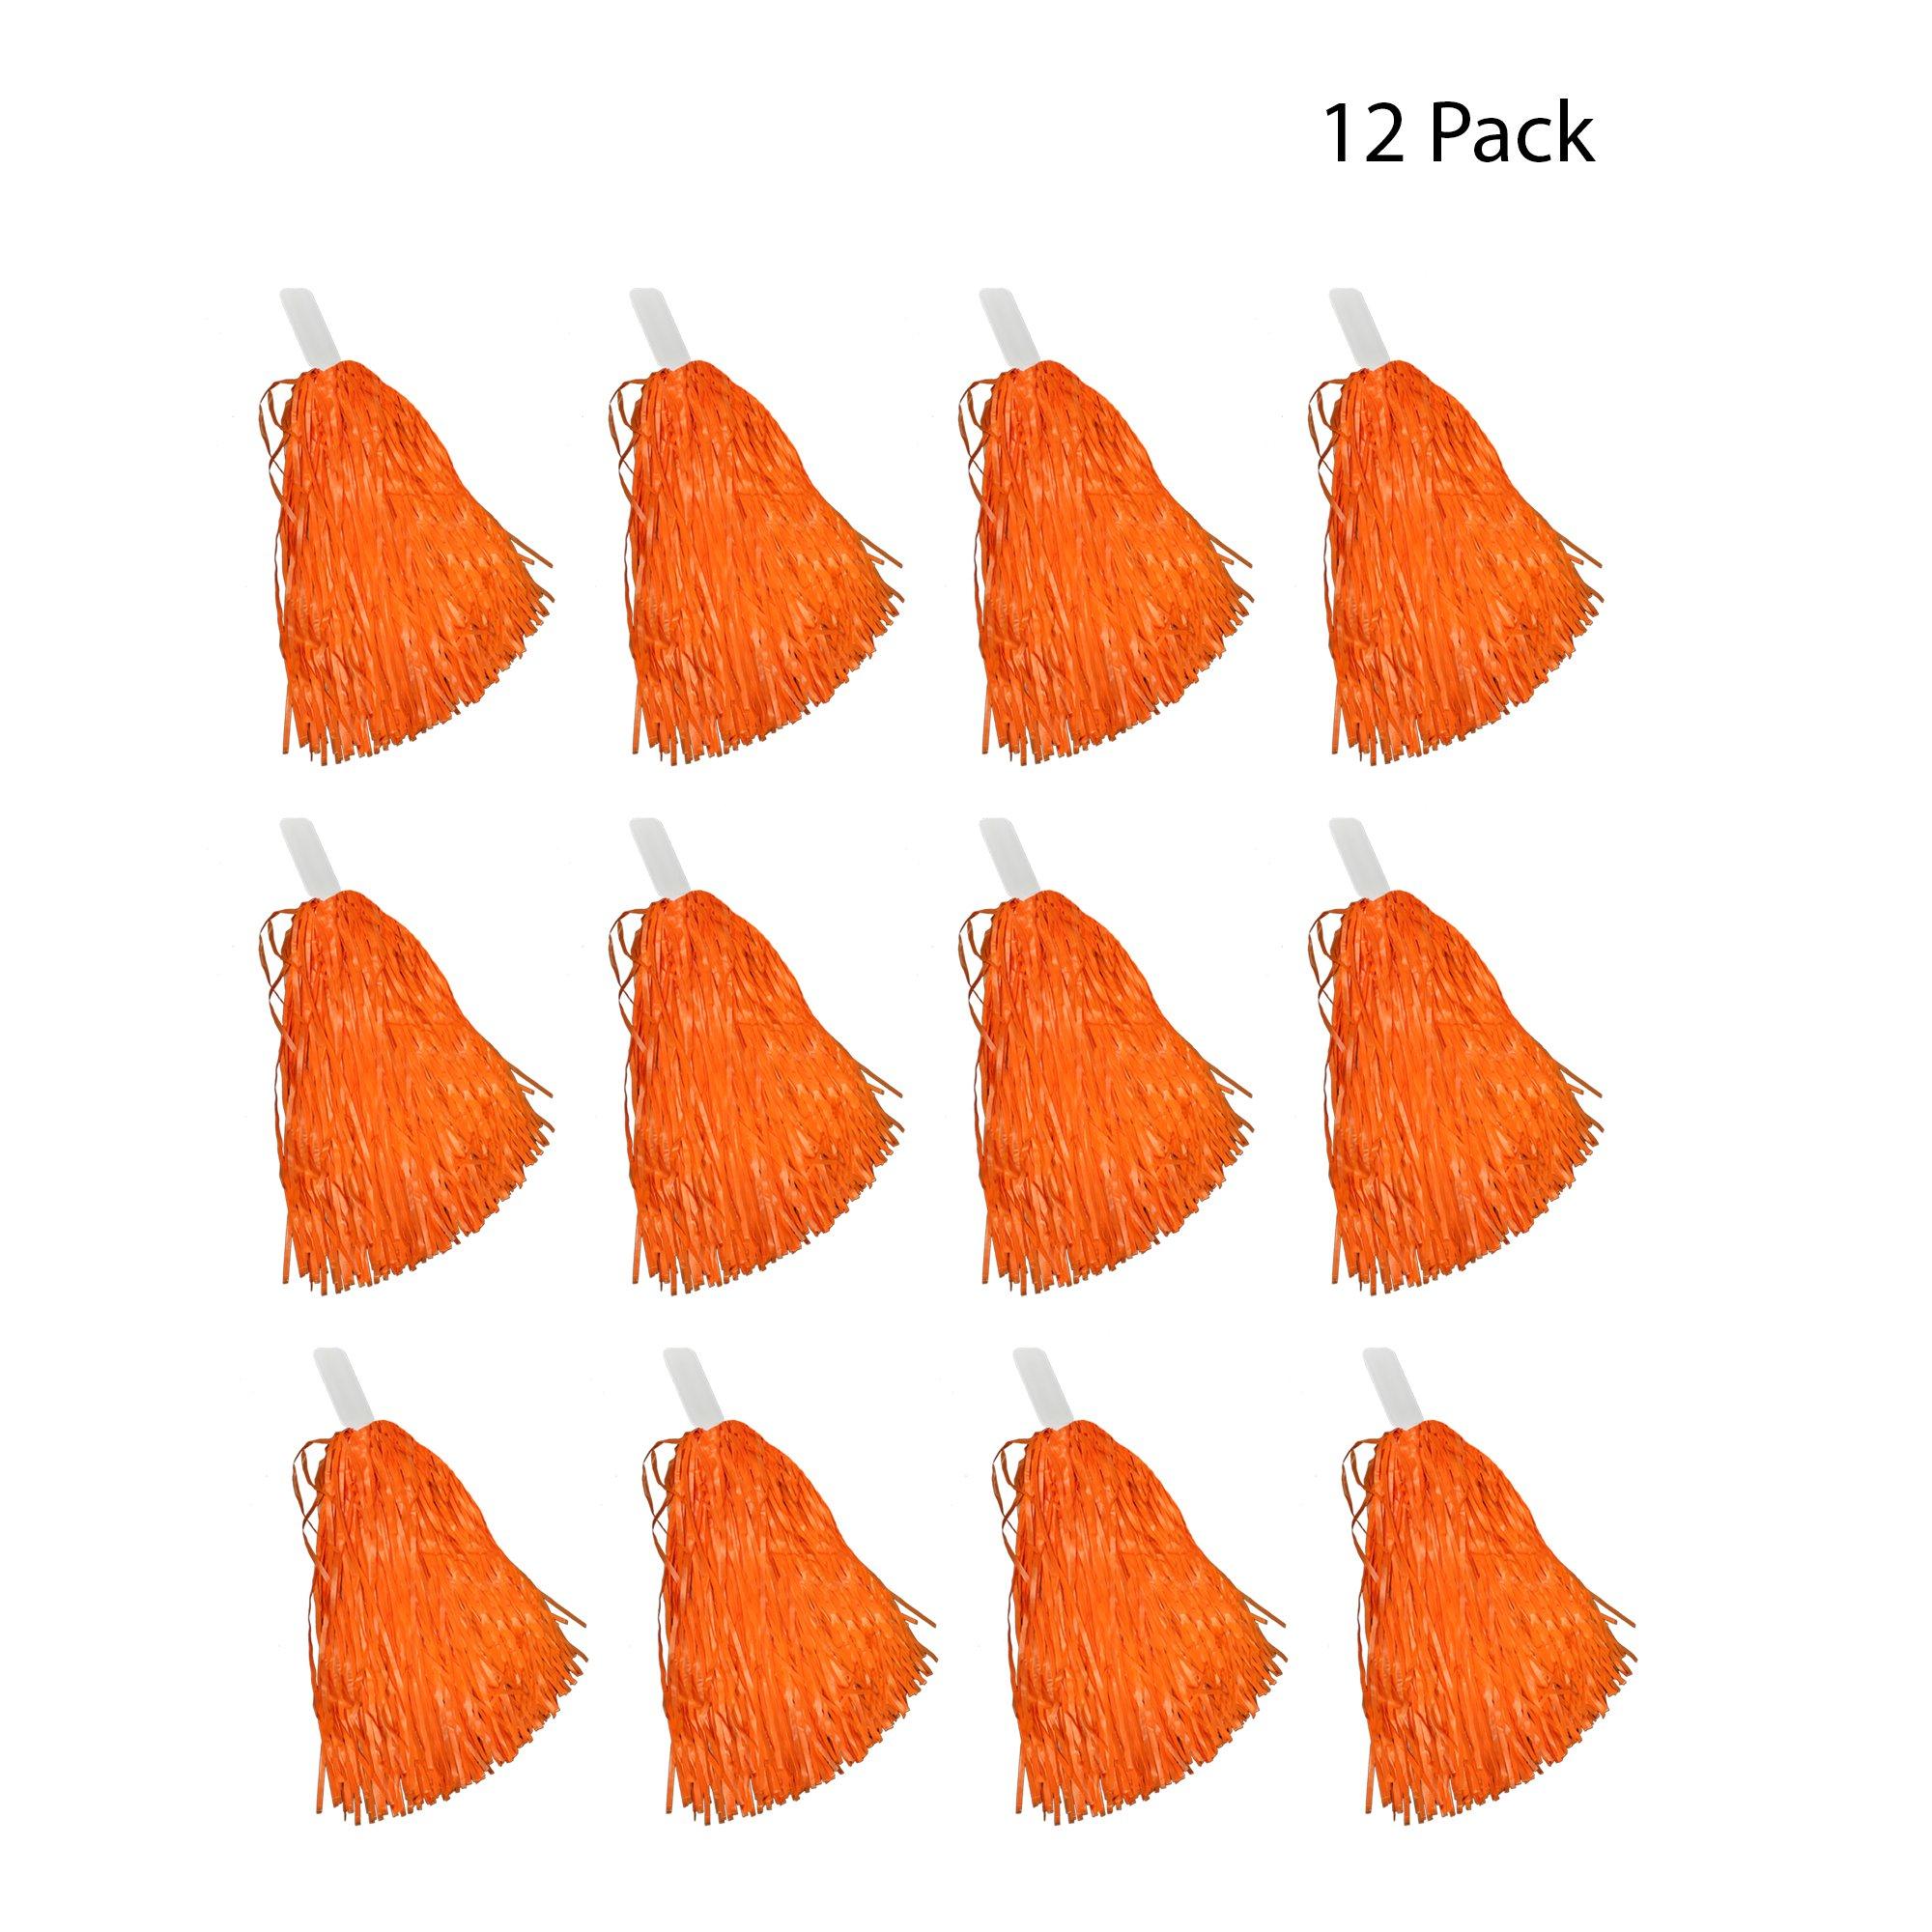 Windy City Novelties Cheerleader Pom Poms - 12 Pack (Orange)